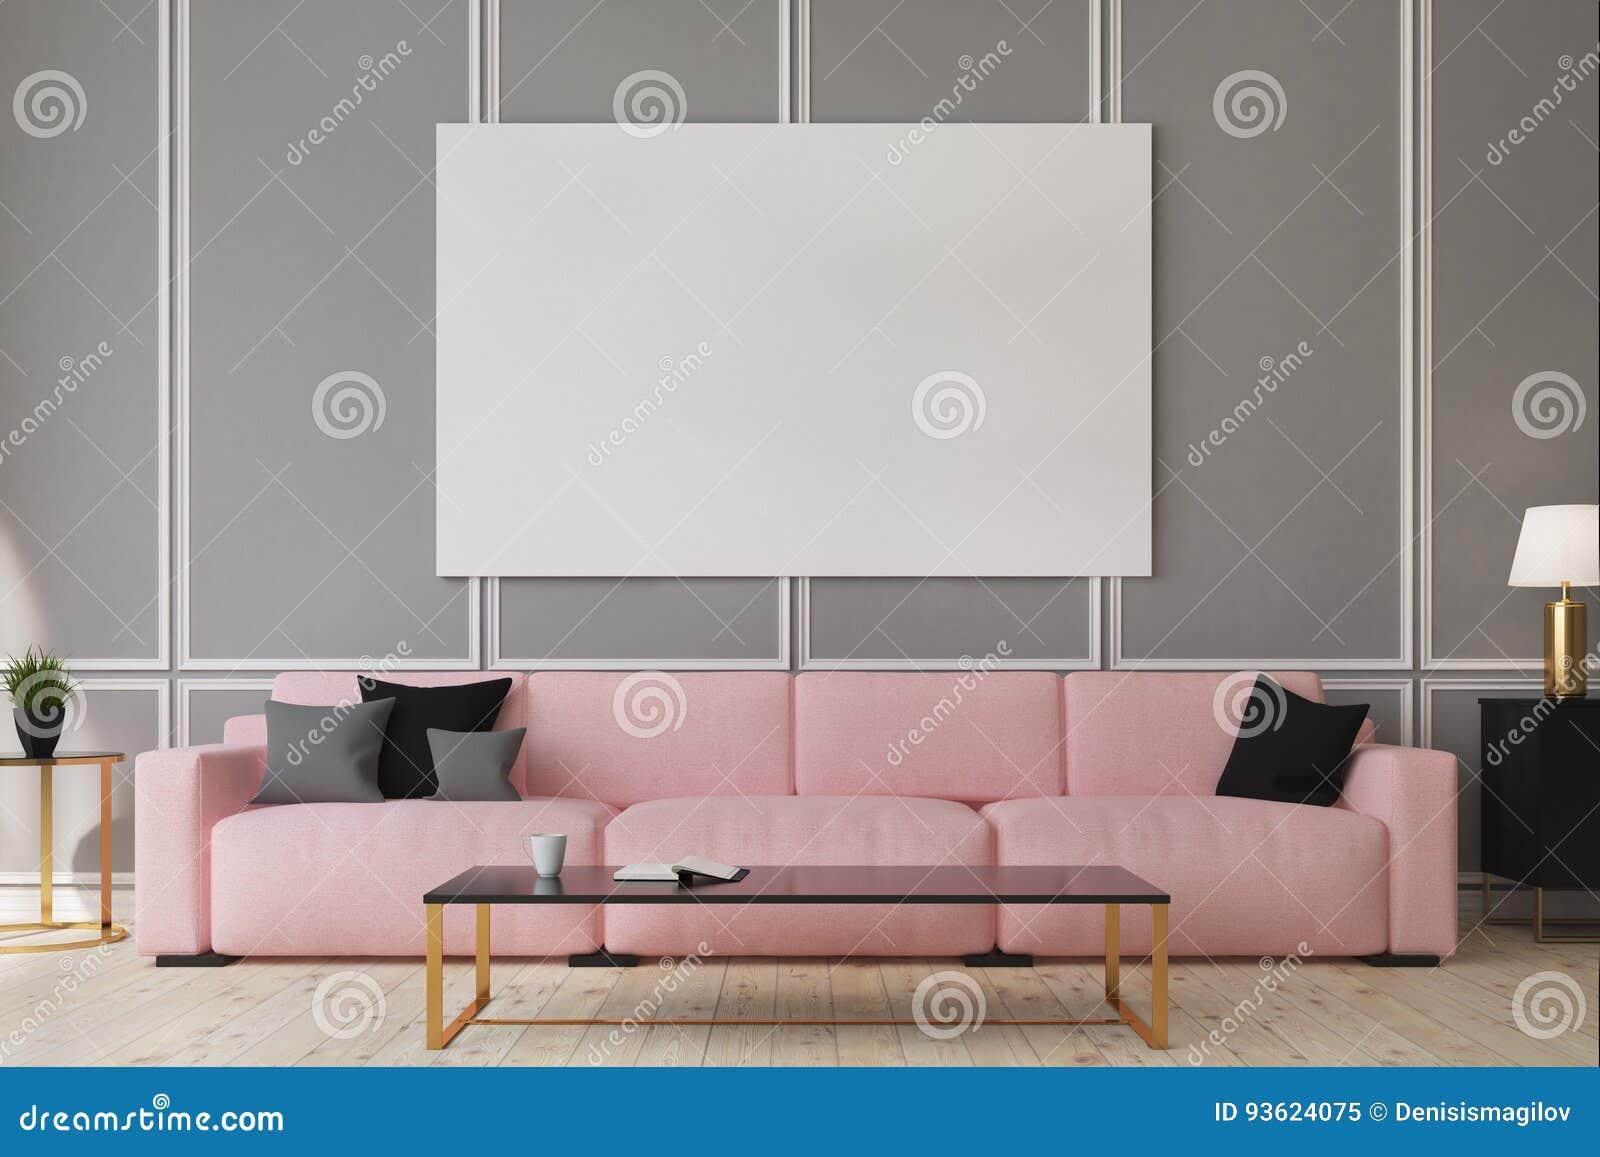 Salon Rose De Sofa, Affiche Illustration Stock - Illustration du ...